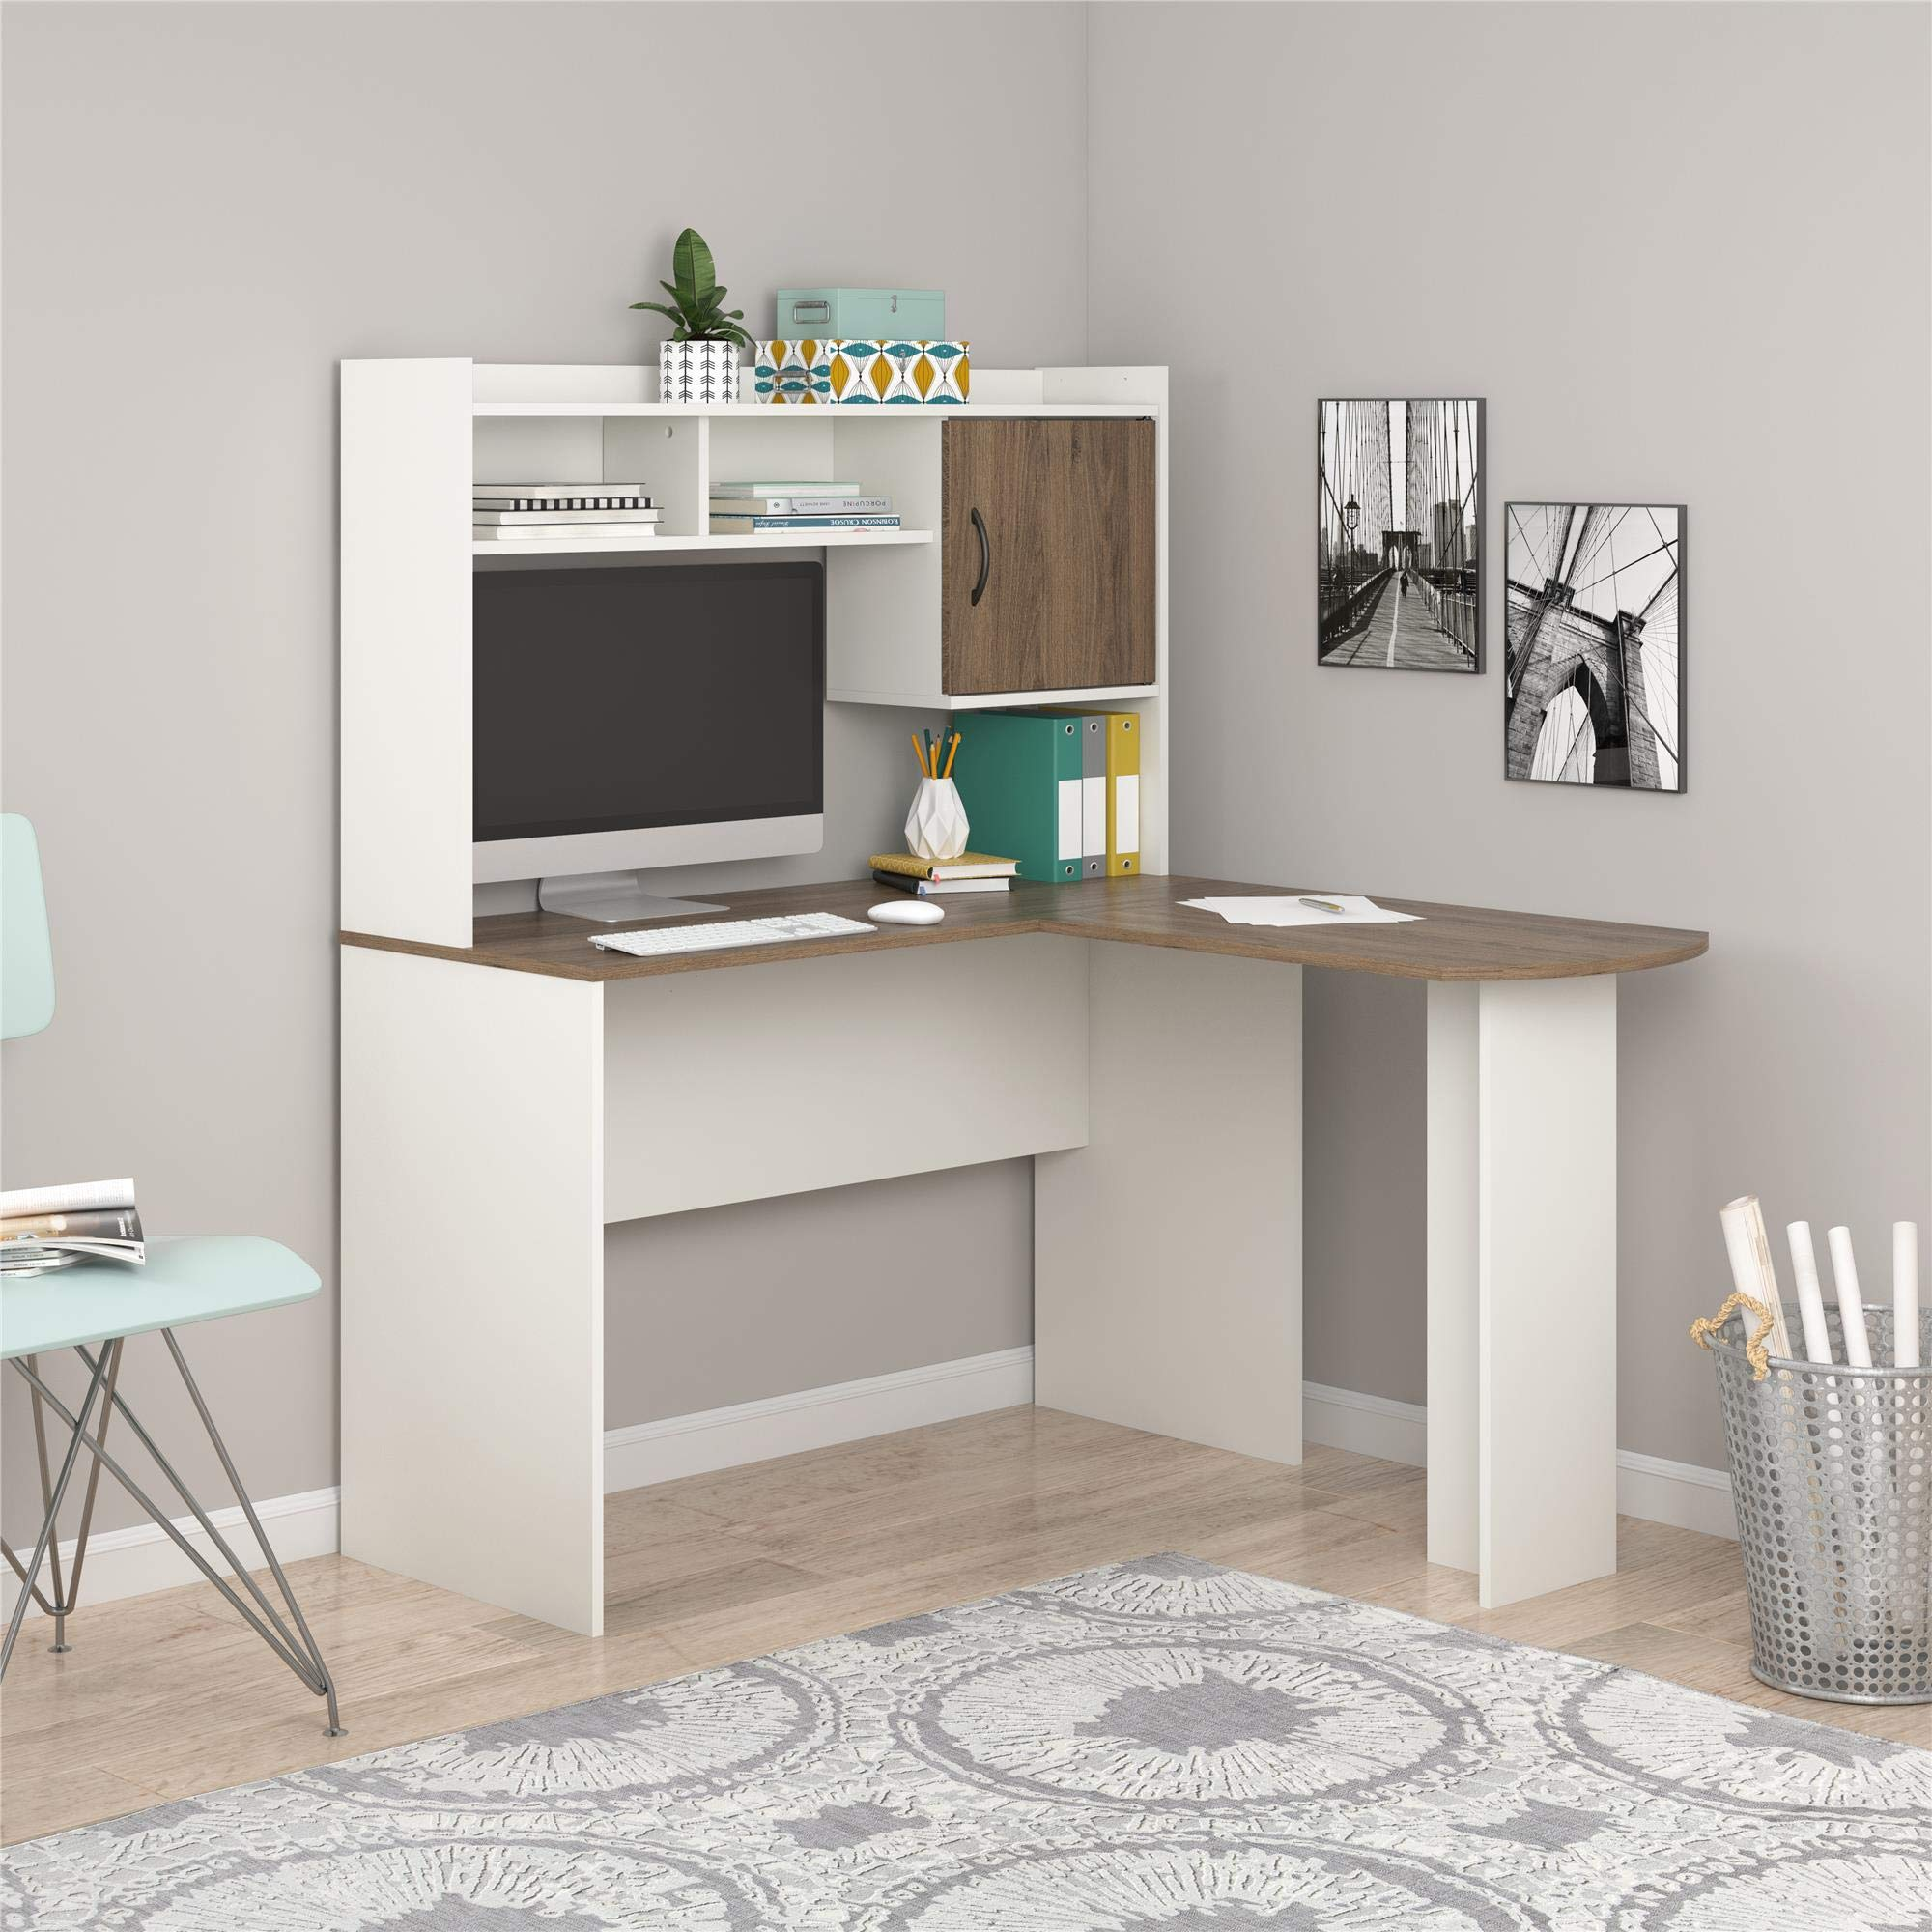 Mainstays Student Desk, Black (L-Shaped Desk, White) by Mainstay